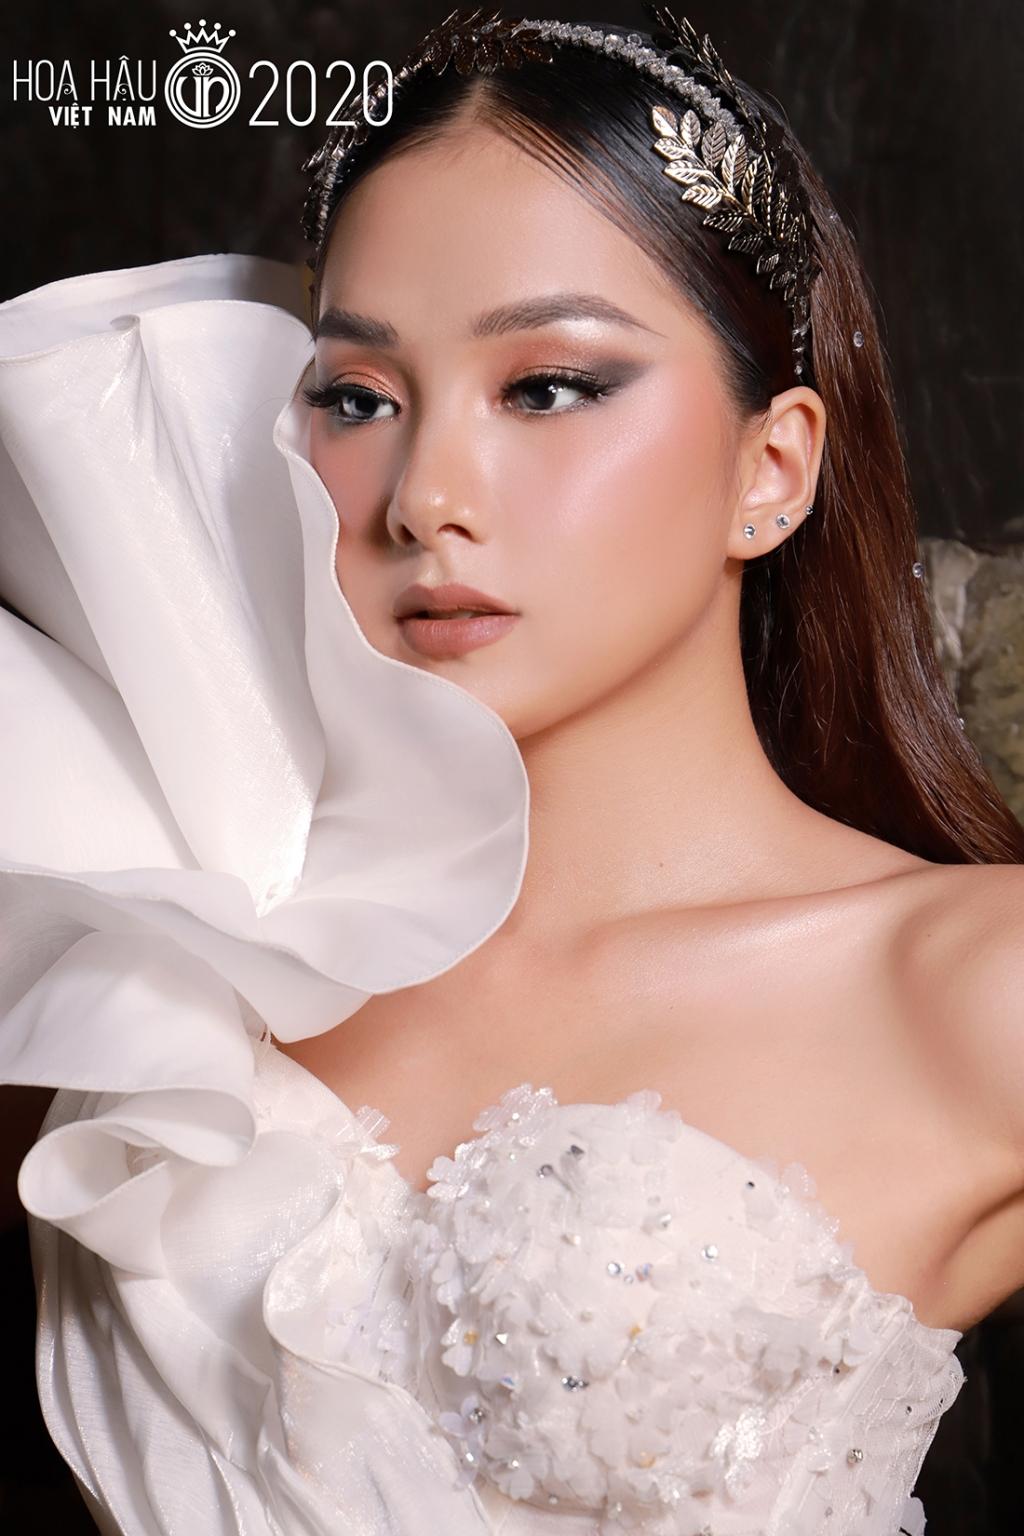 nguoi dep ao dai miss world vietnam 2019 dang ky du thi hoa hau viet nam 2020